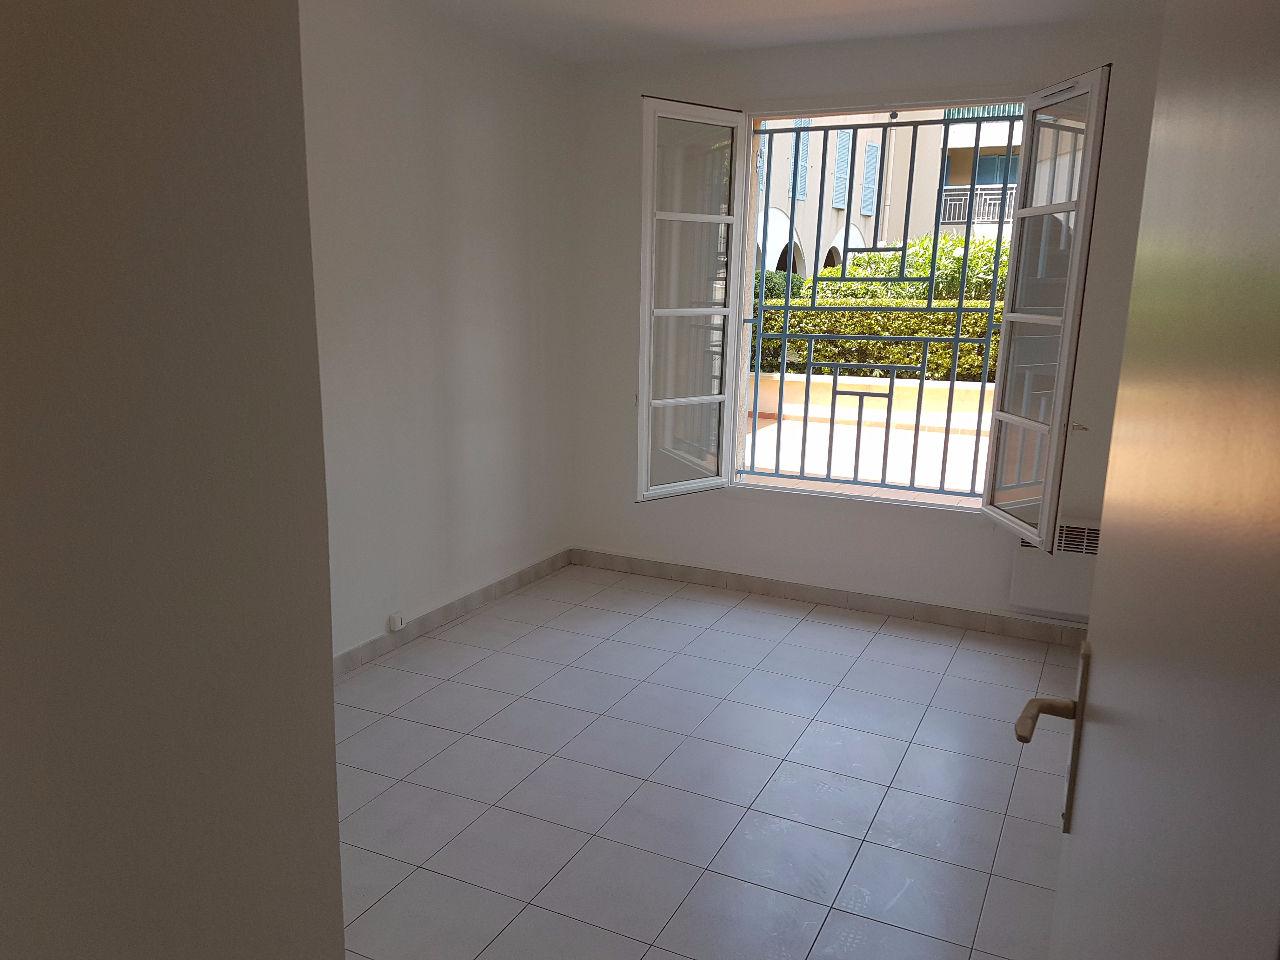 immobilier allauch a vendre vente acheter ach appartement allauch 13190. Black Bedroom Furniture Sets. Home Design Ideas